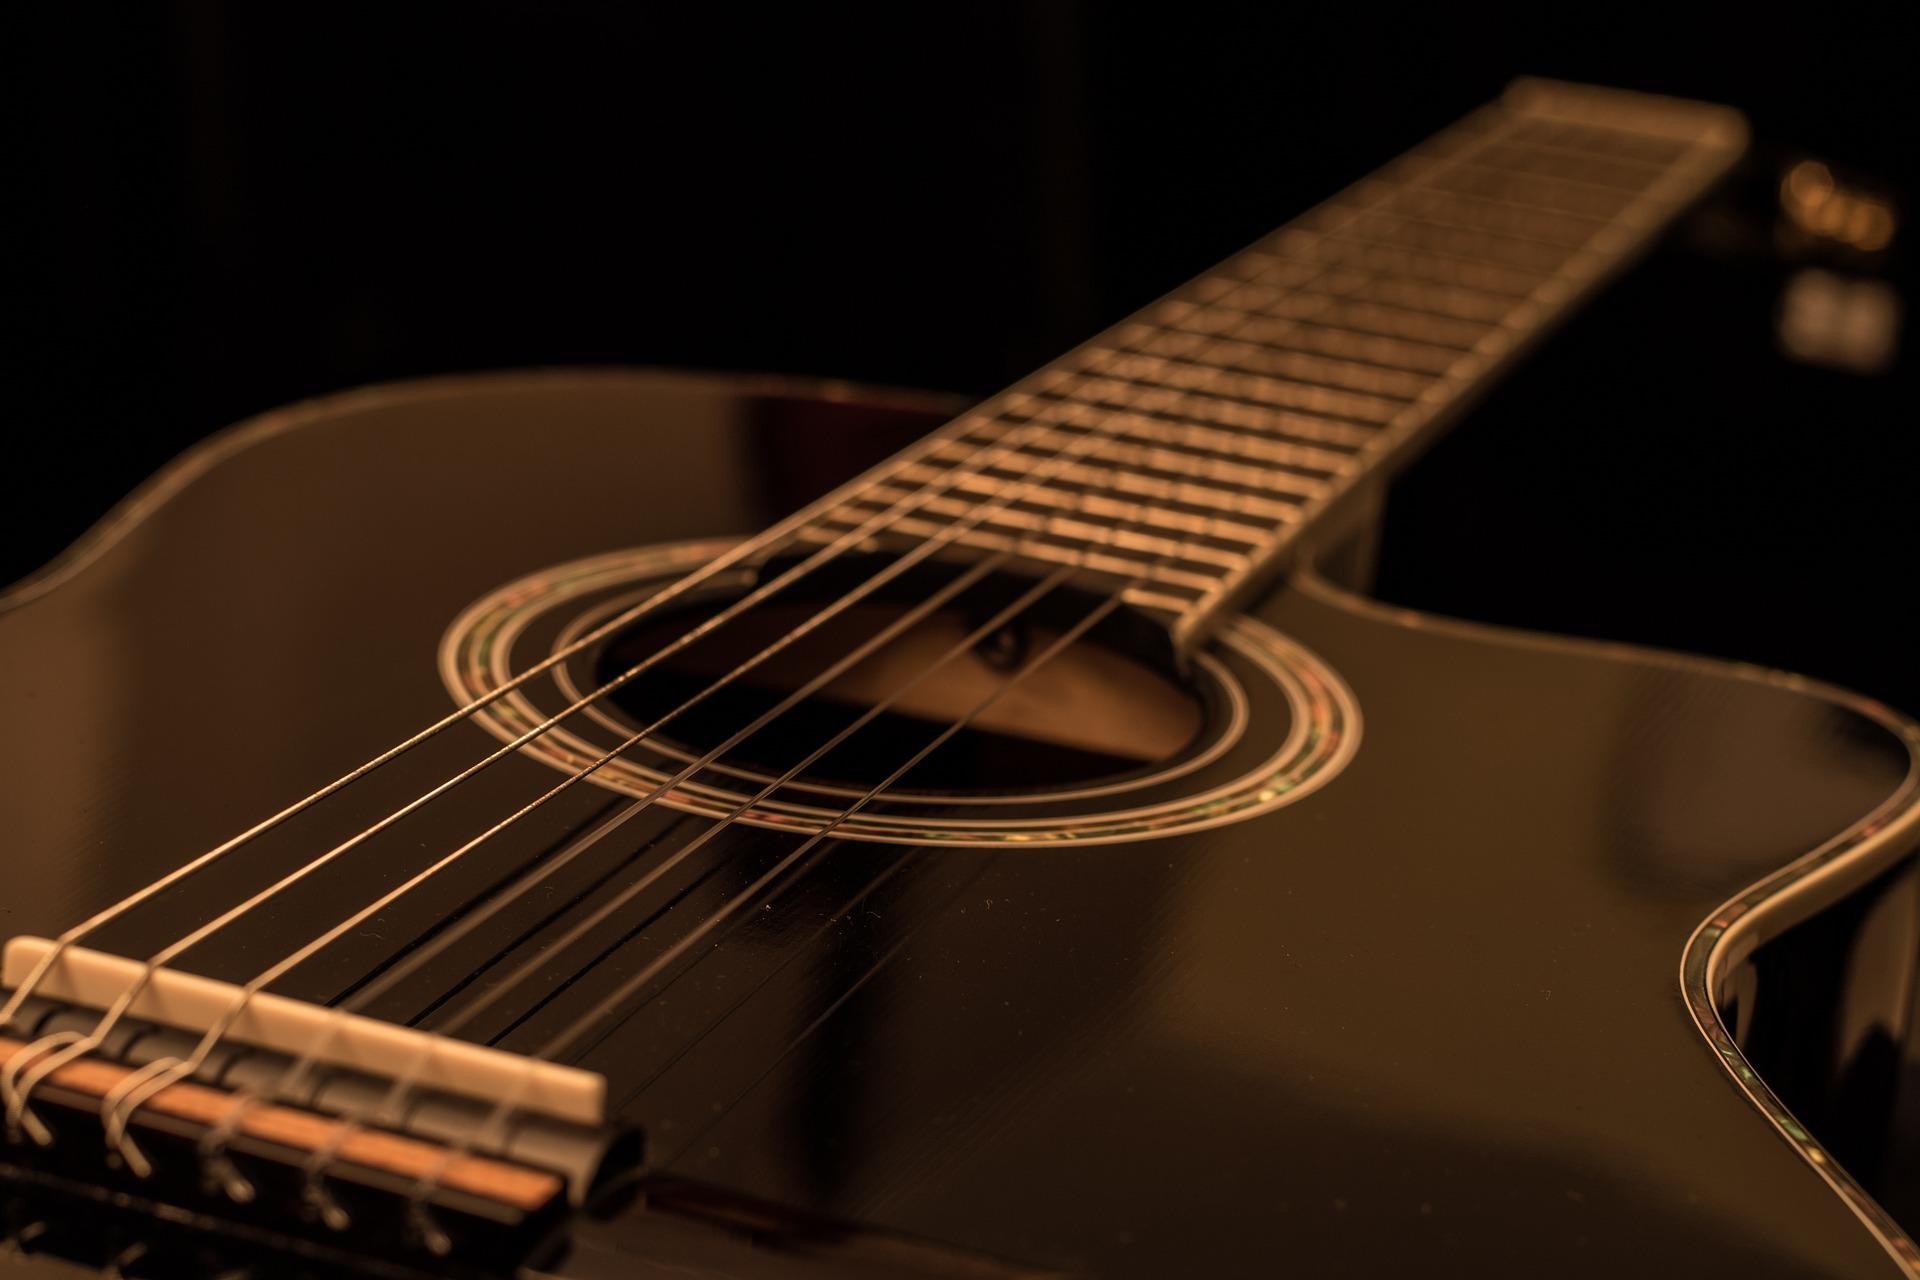 guitar-1159505_1920.jpg